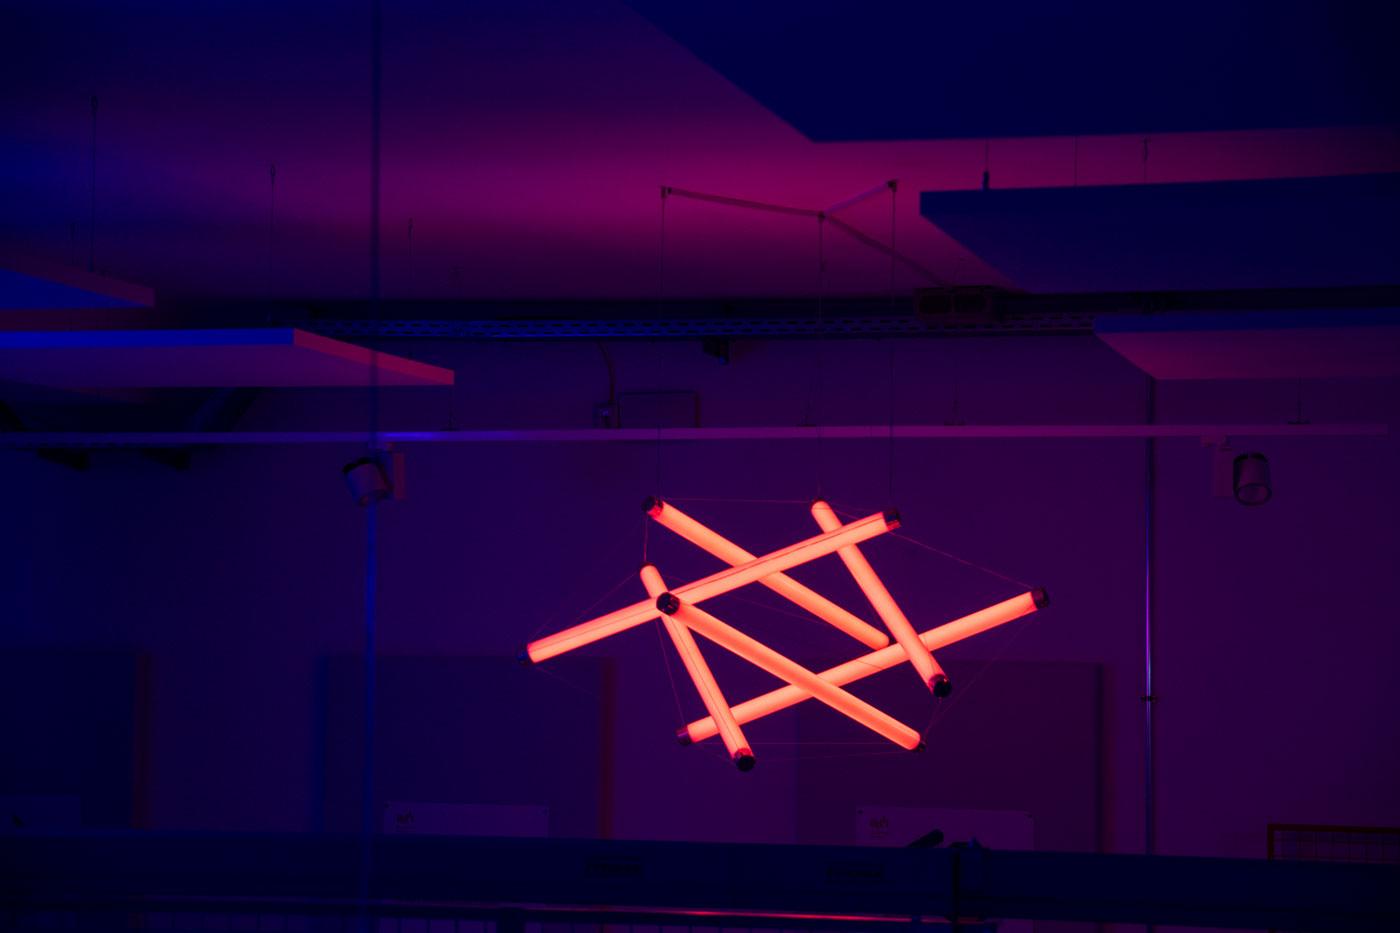 Blau Rot Life Science Factory Göttingen LED Leuchte